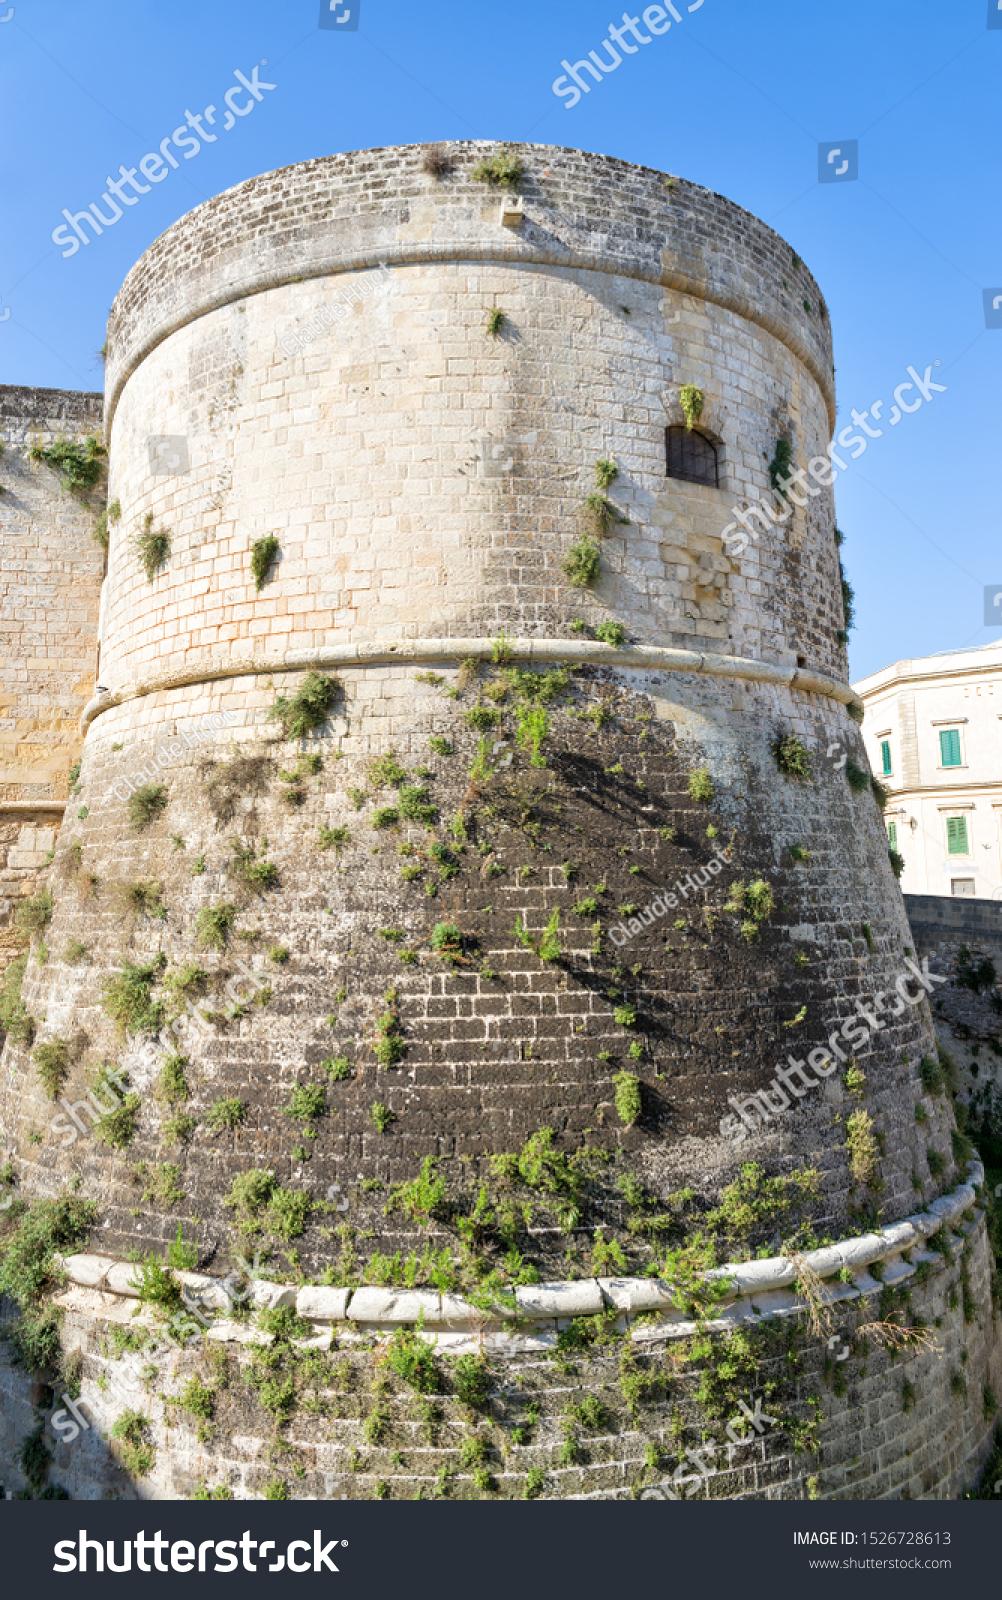 North tower of the Aragonese Castle of Otranto in Otranto, Italy